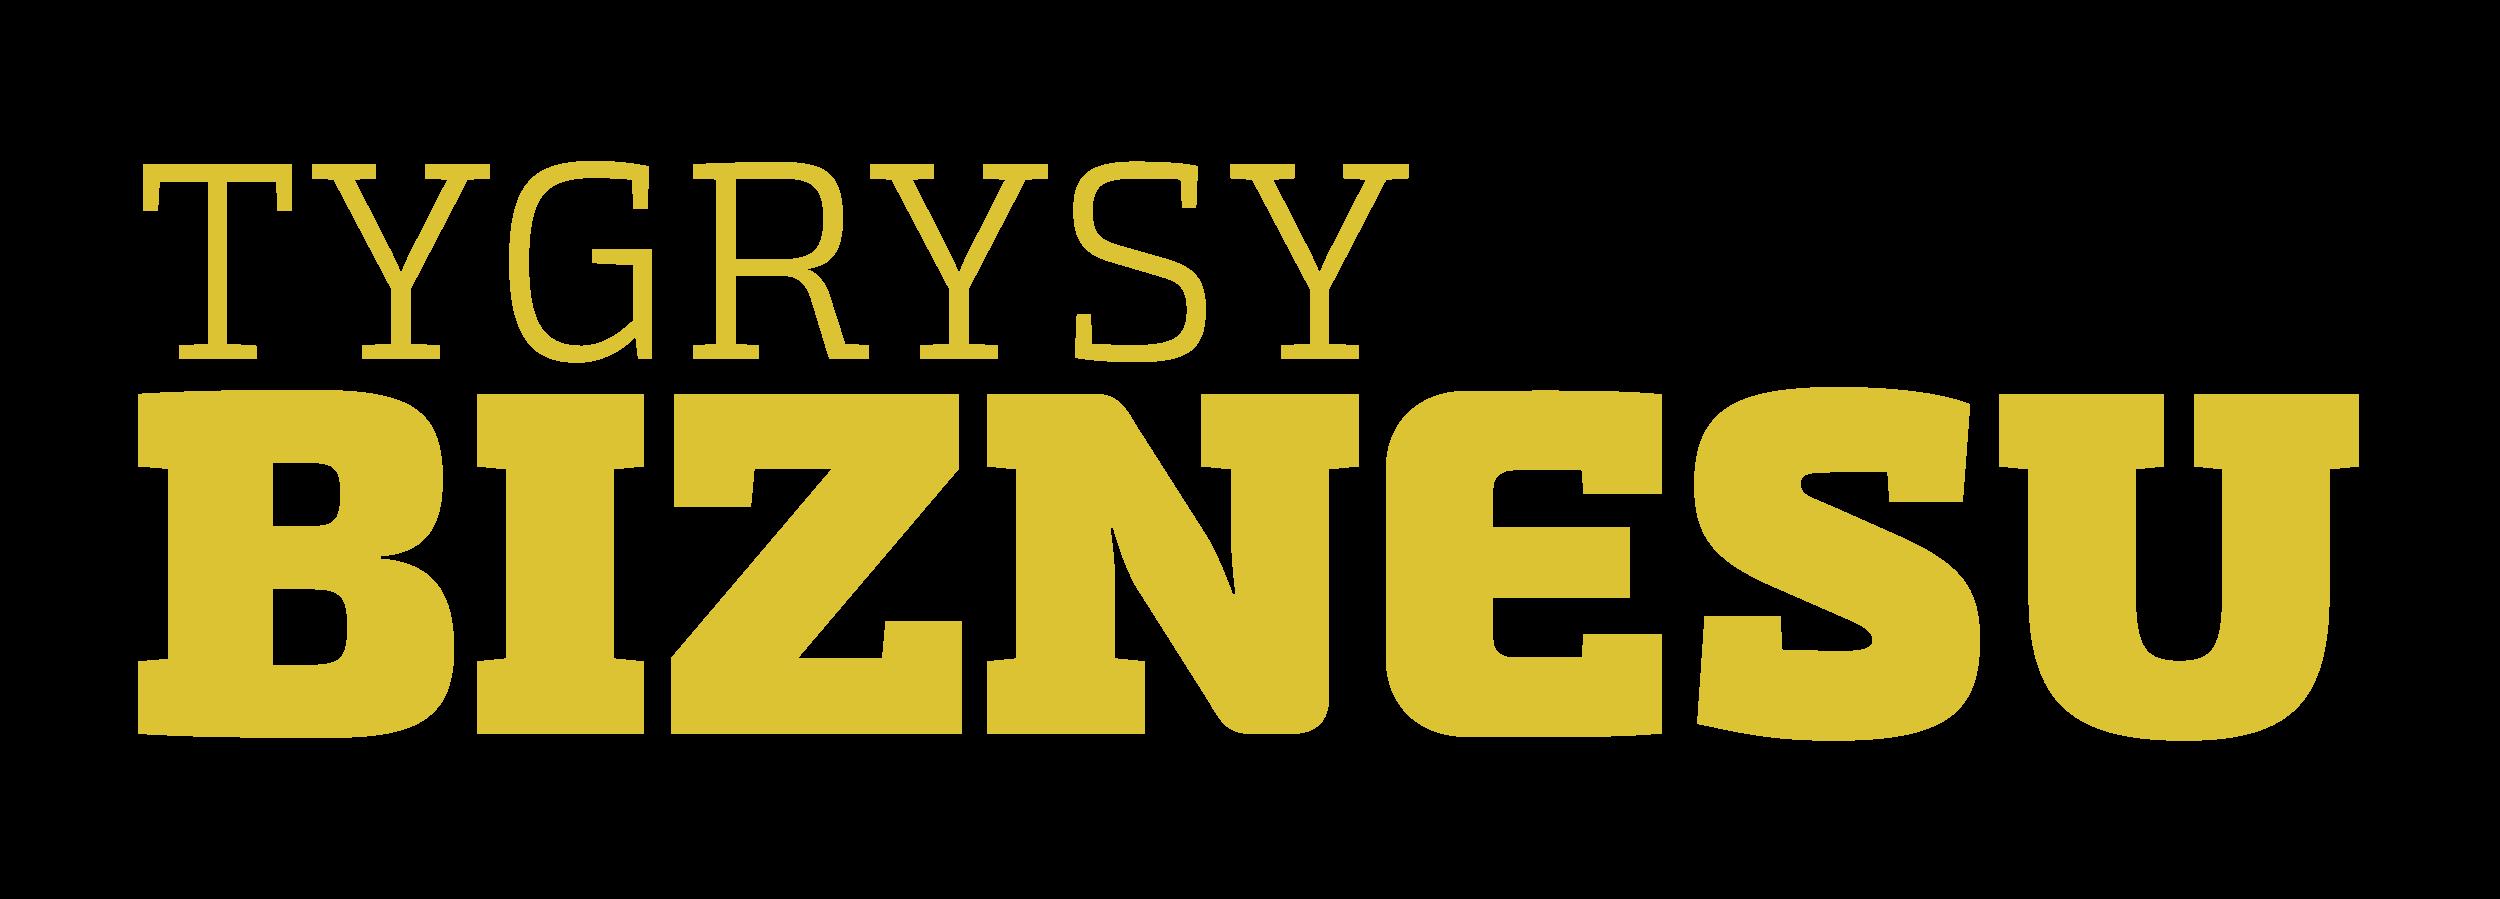 37 Tygrysy-Biznesu-GOLD-792